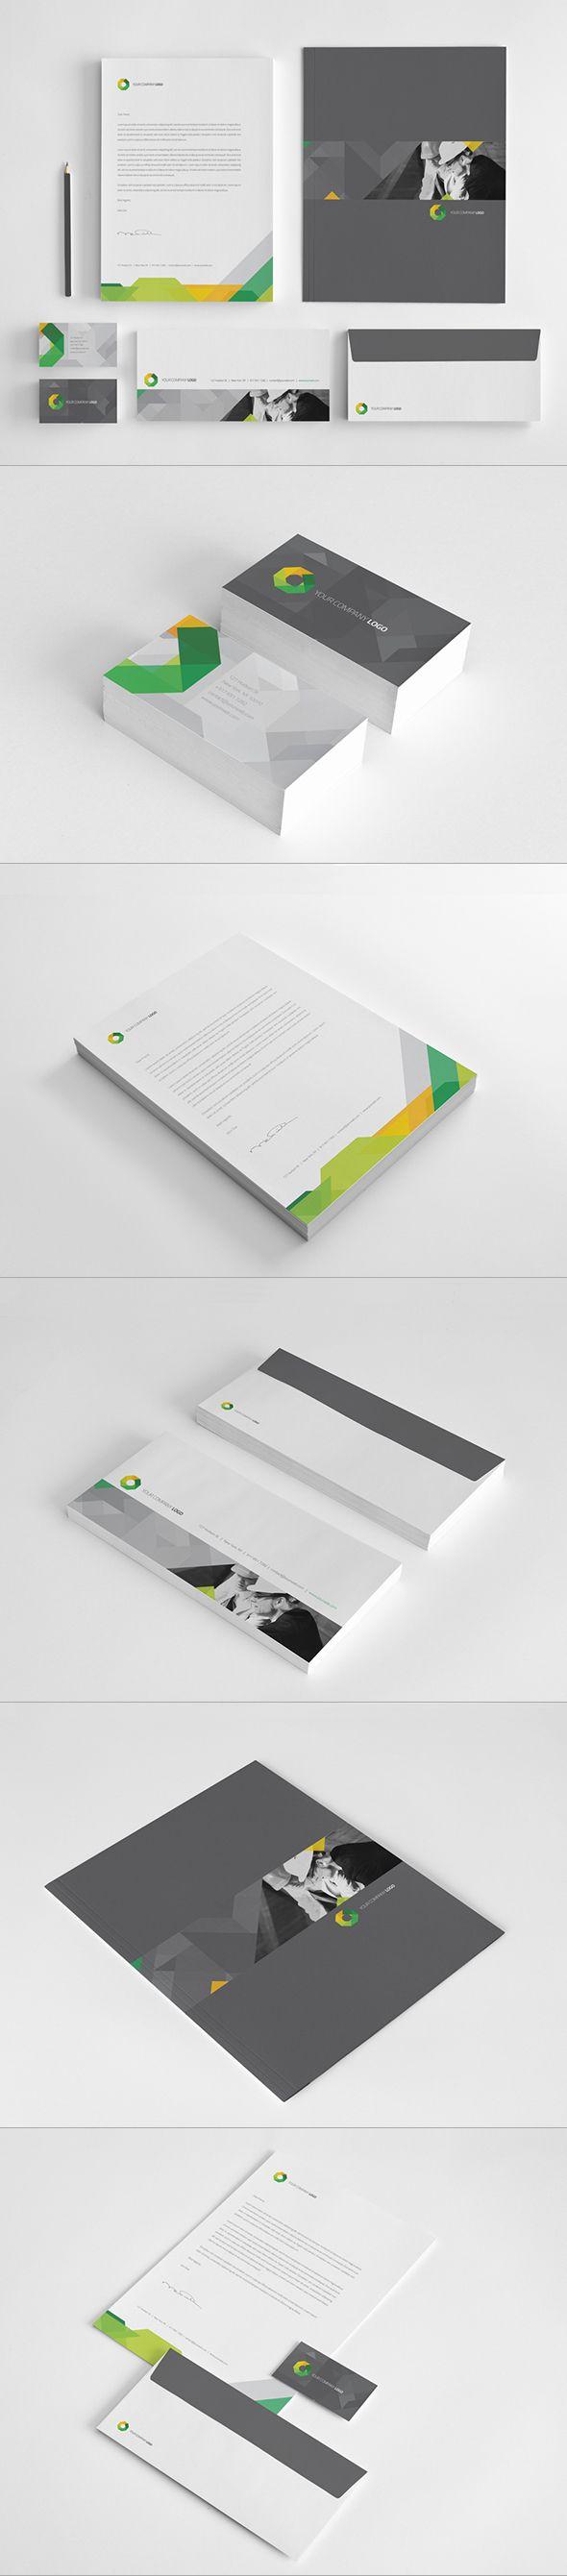 Modern Architecture Stationary by Abra Design, via Behance #design #stationary